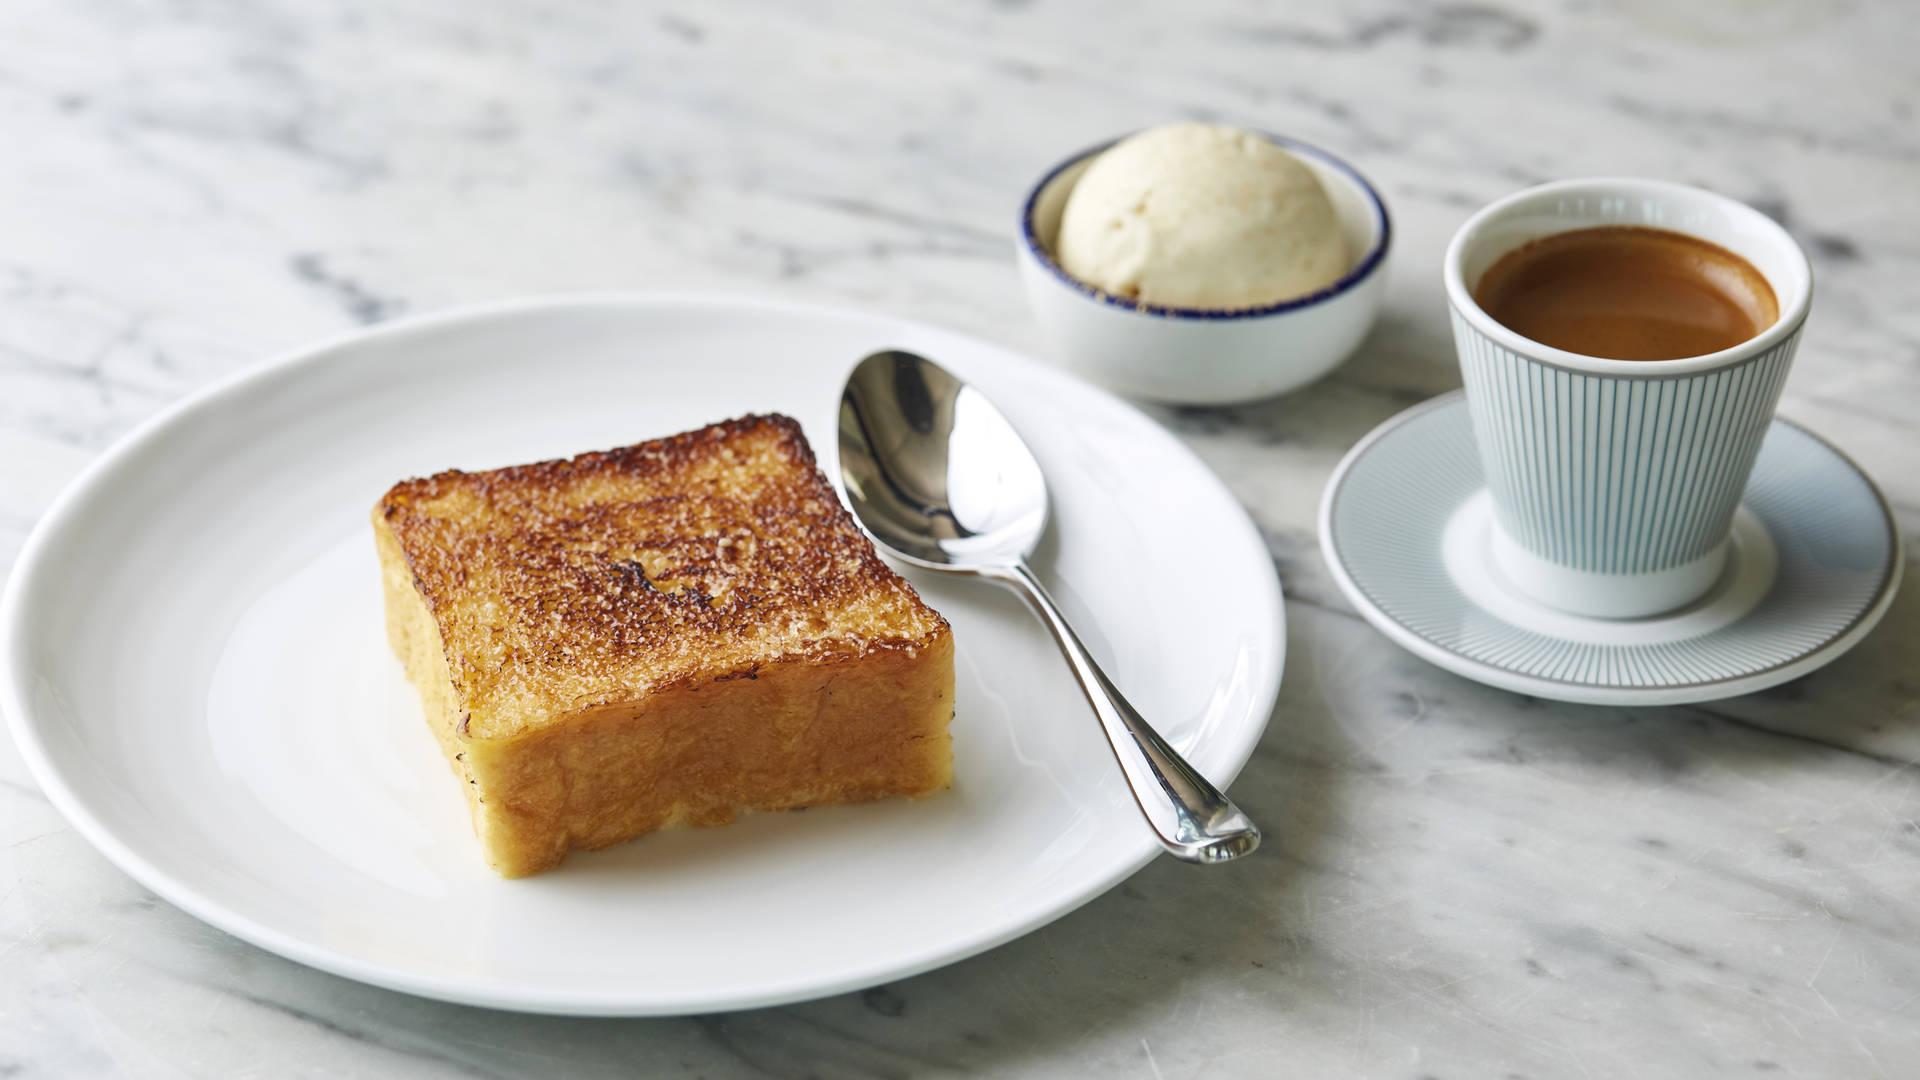 French toast brioche pudding at bleu blanc rouge brunch French Riviera Jumeirah Al Qasr Dubai